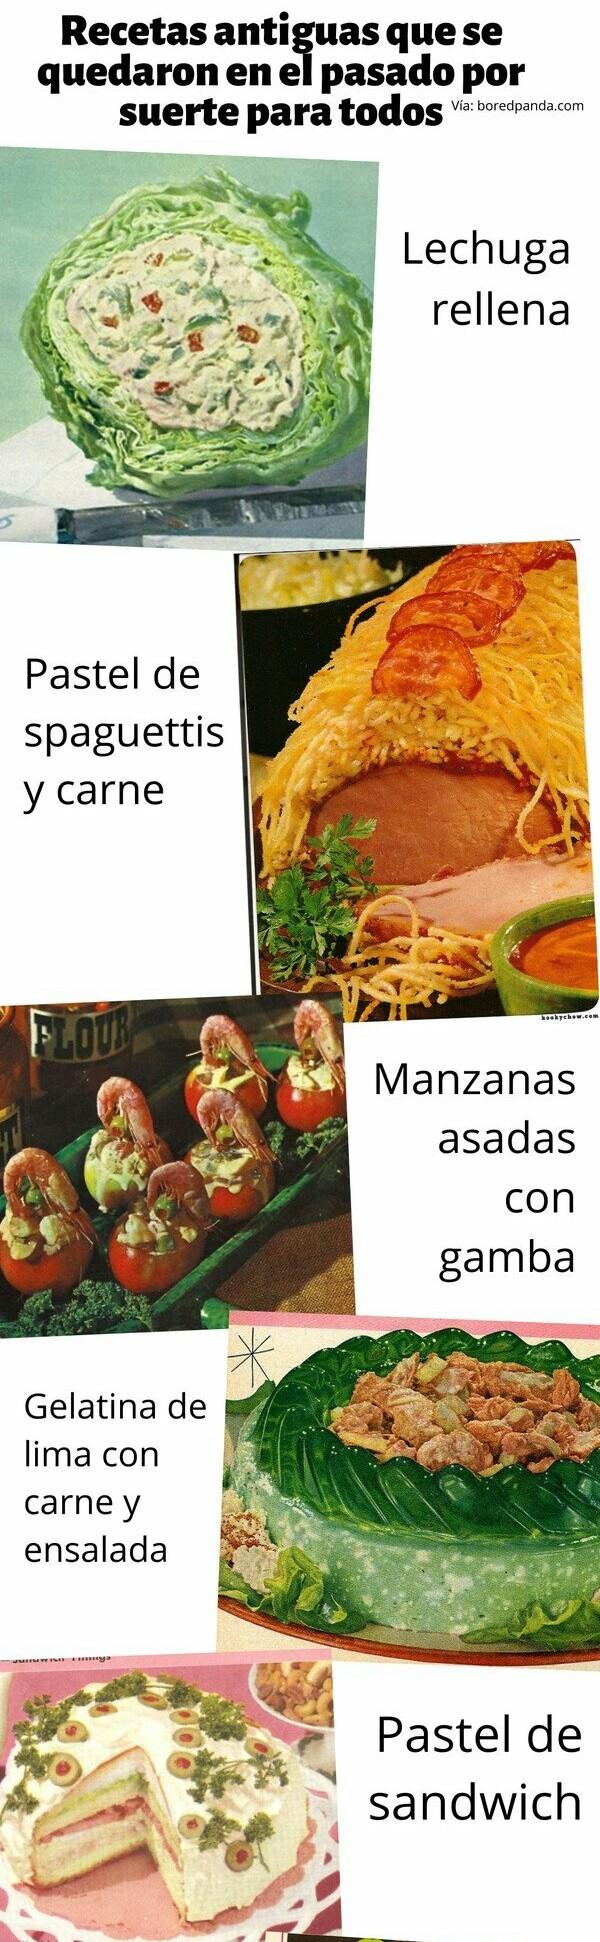 Recetas - meme